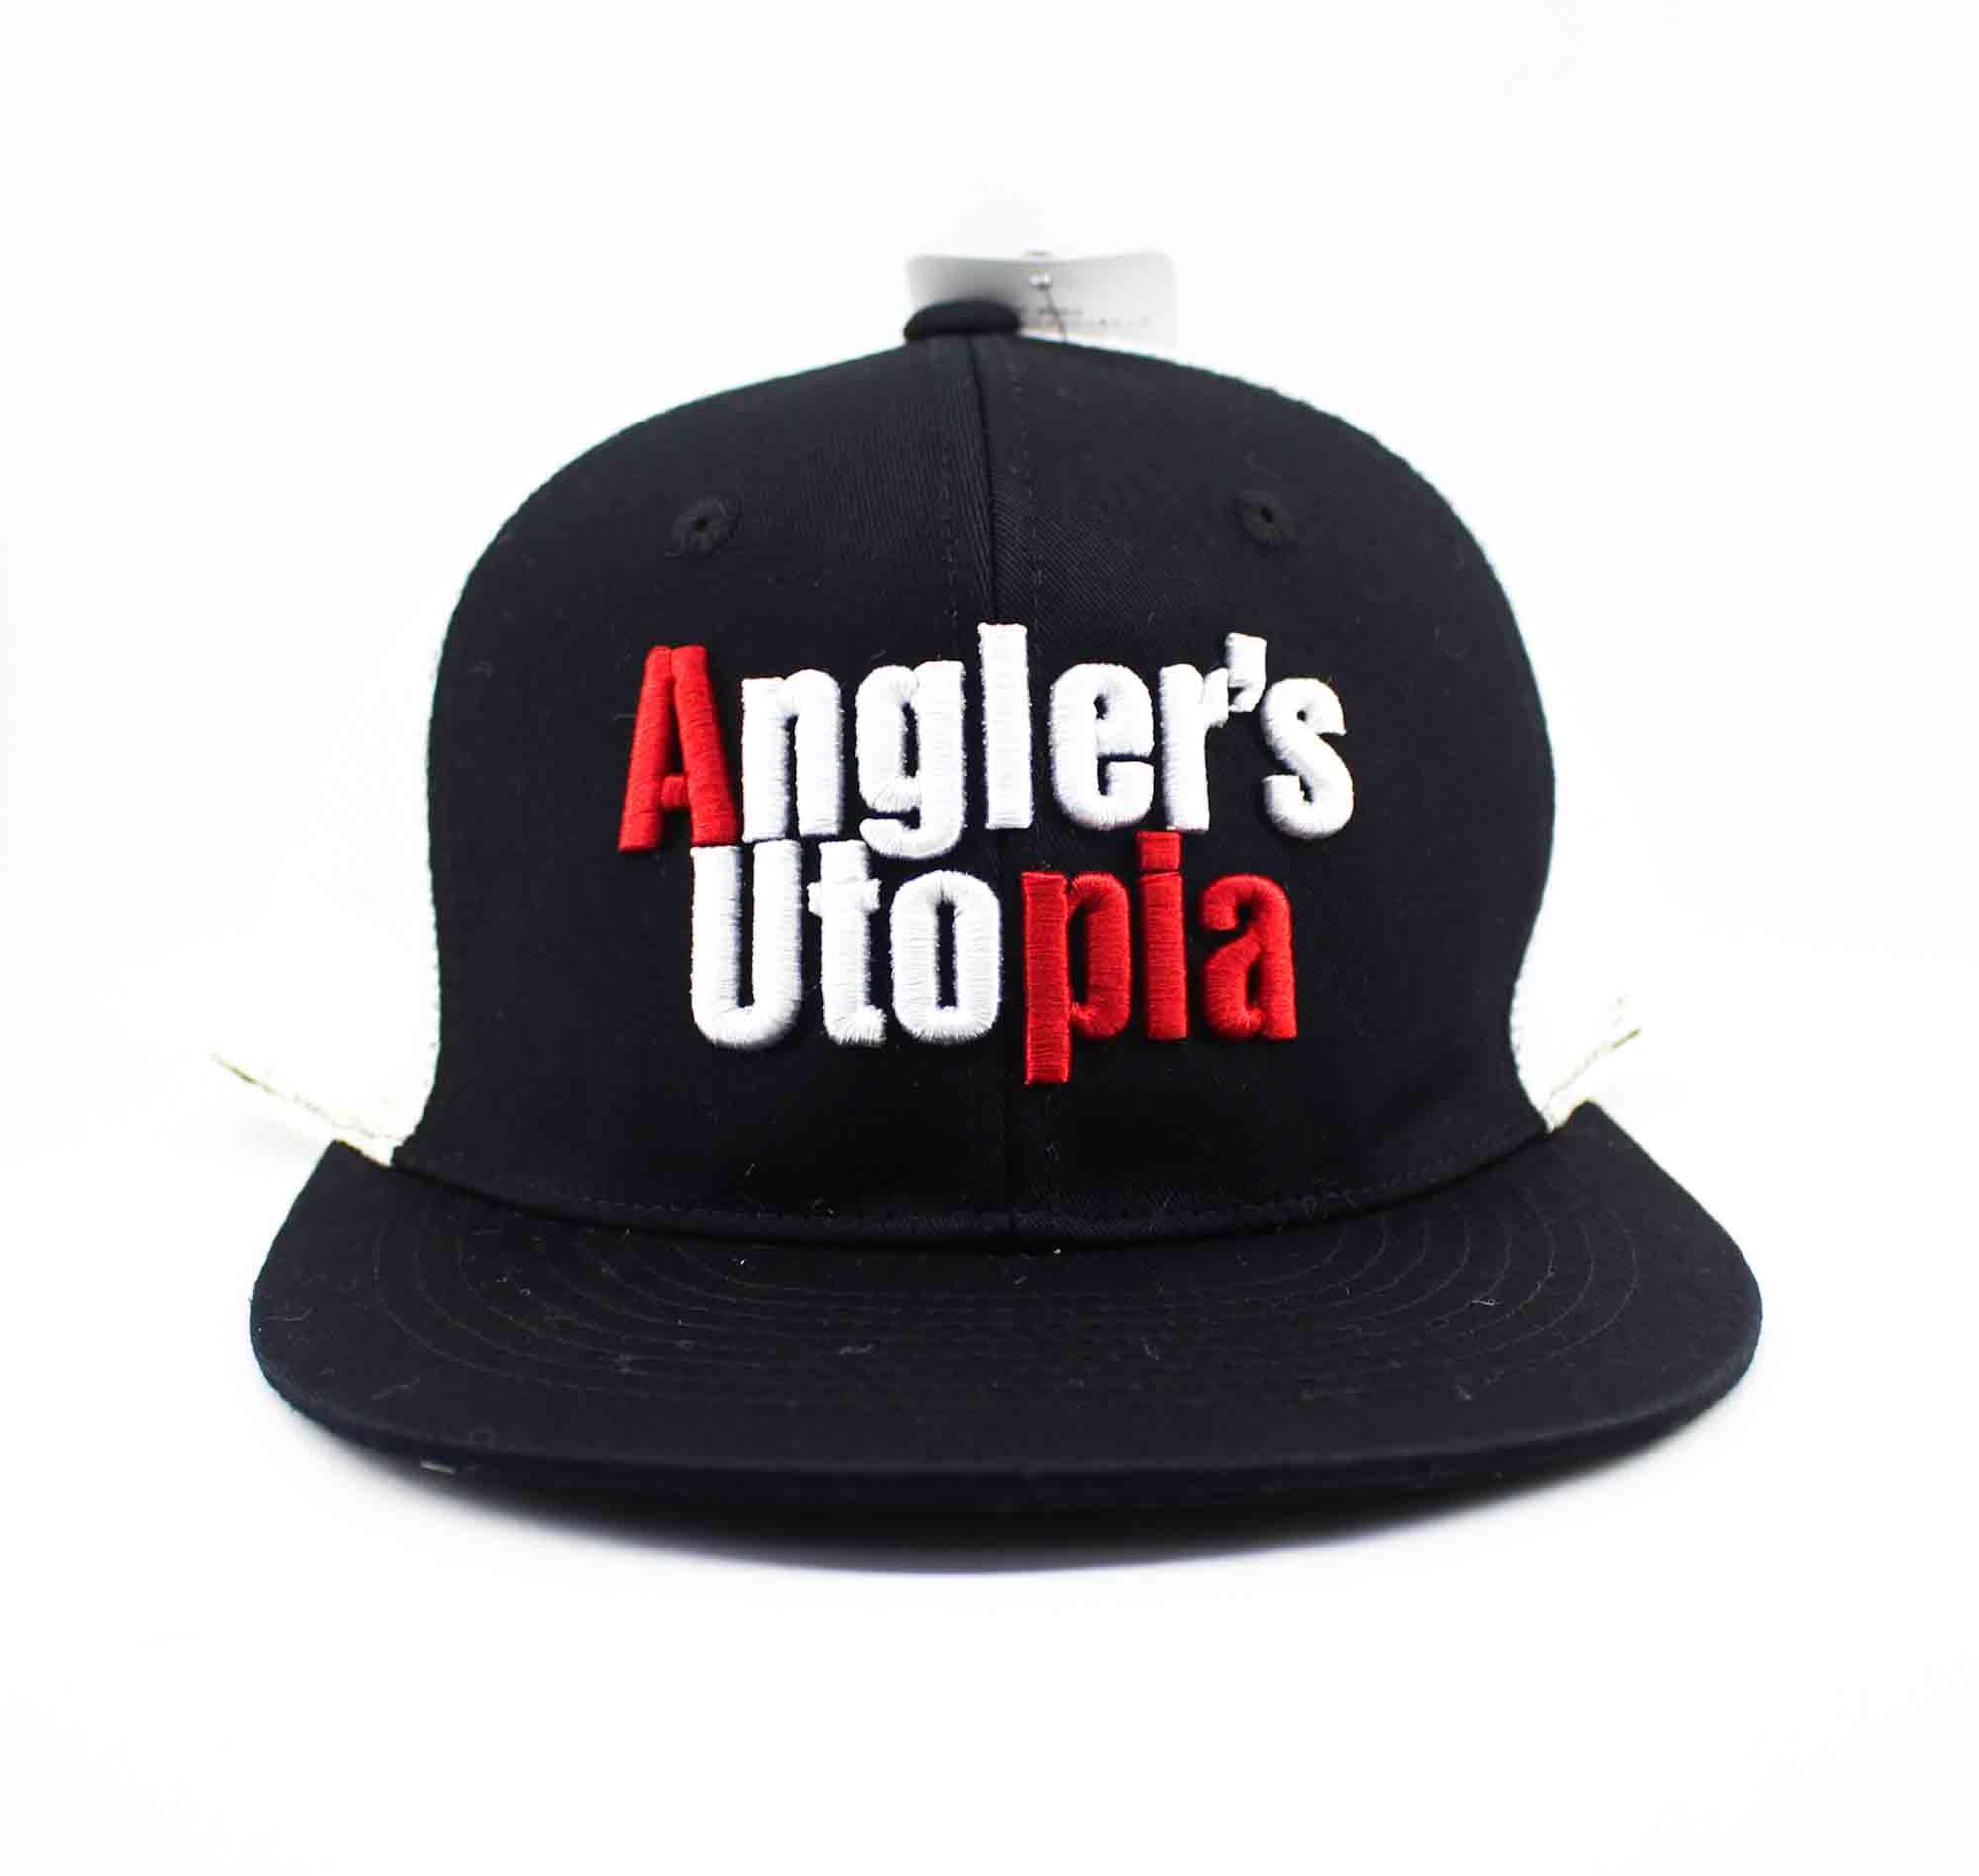 Apia Cap Flat Mesh Cap Free Size Black Red (9877)